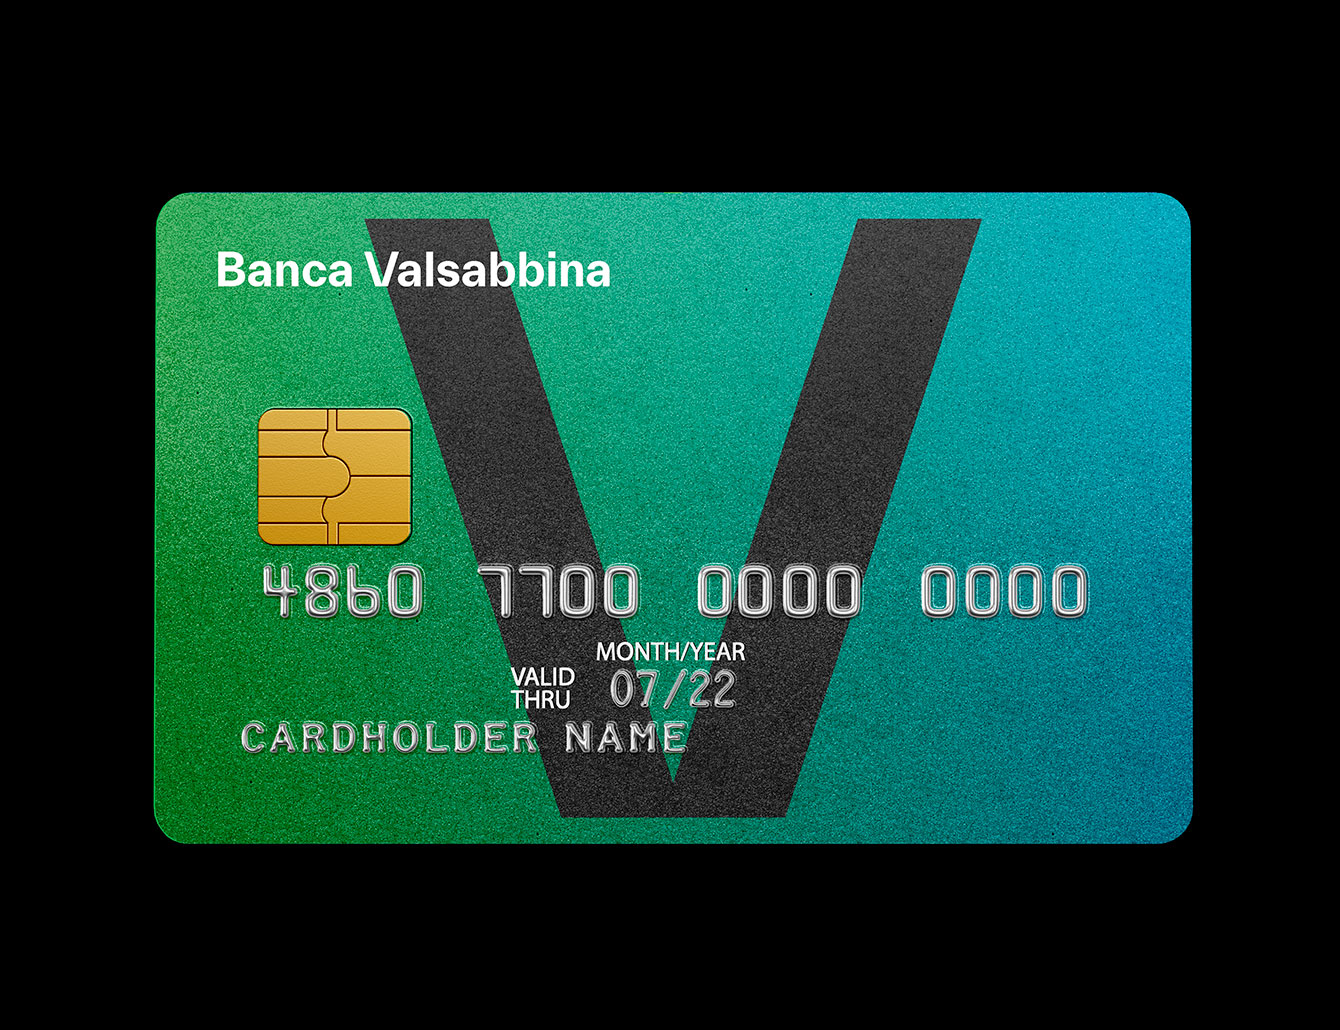 we cash | Banca Valsabbina